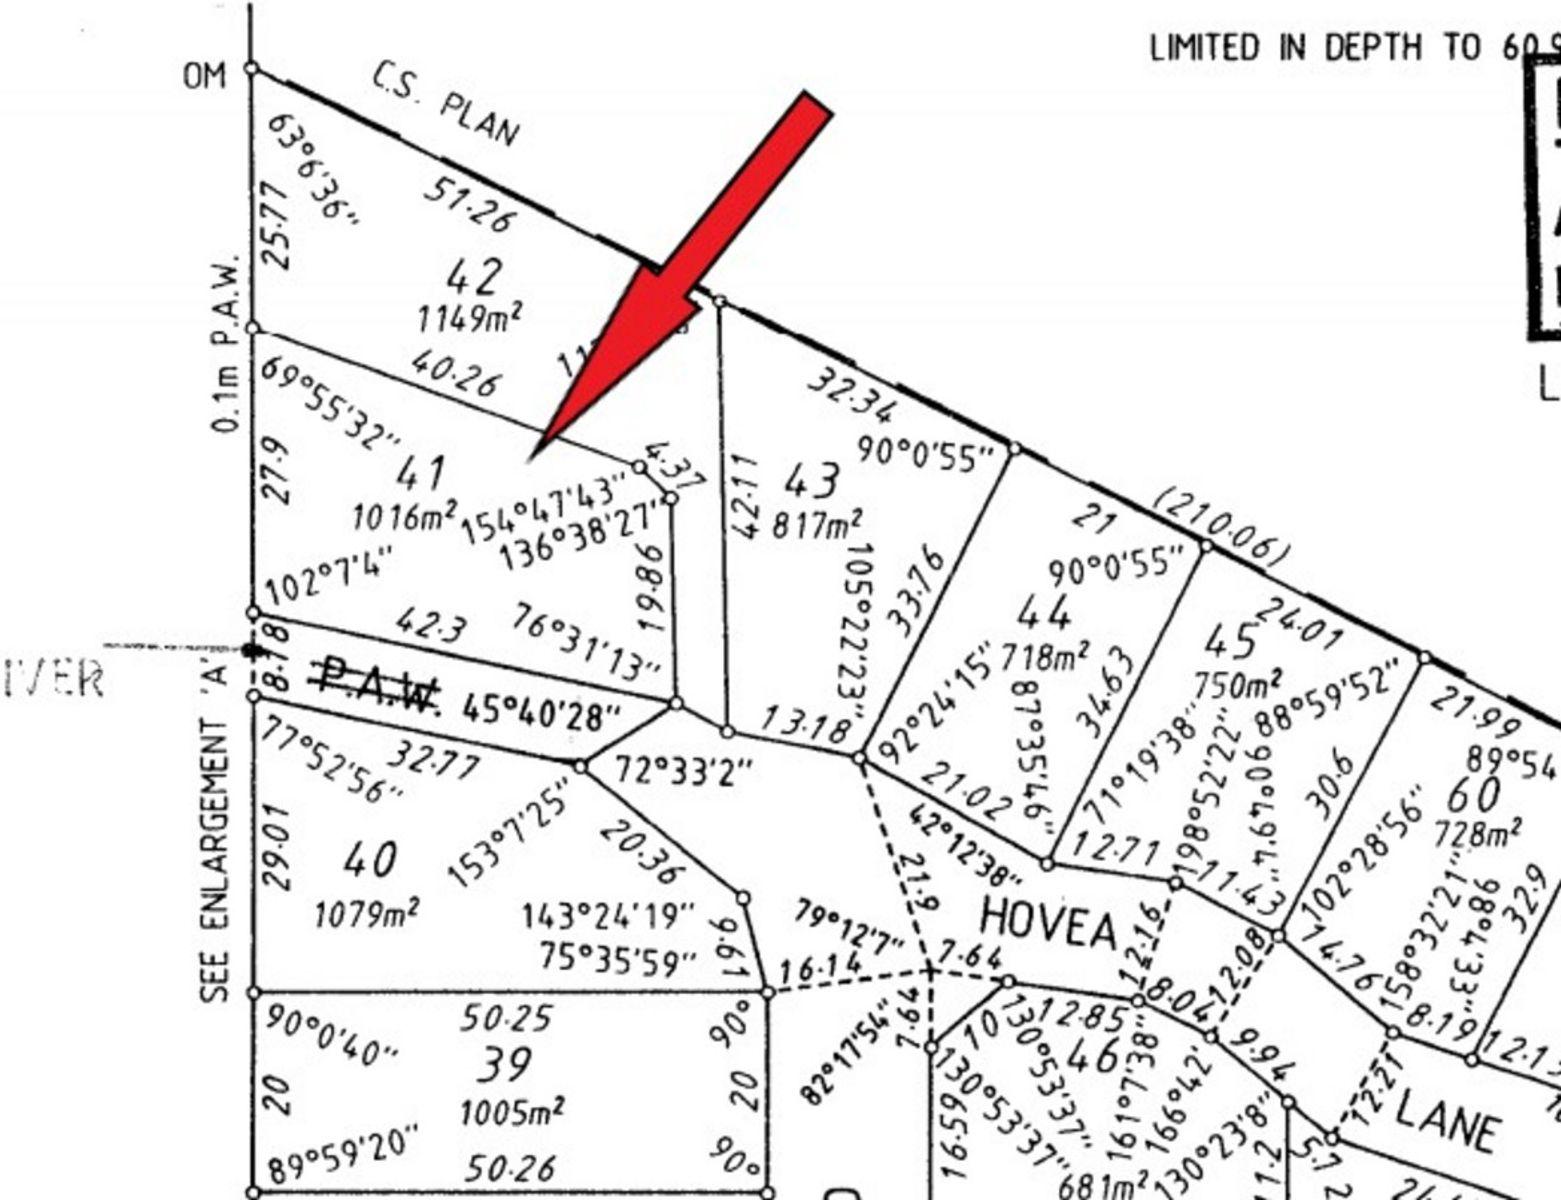 14 Hovea Lane, Margaret River, WA 6285